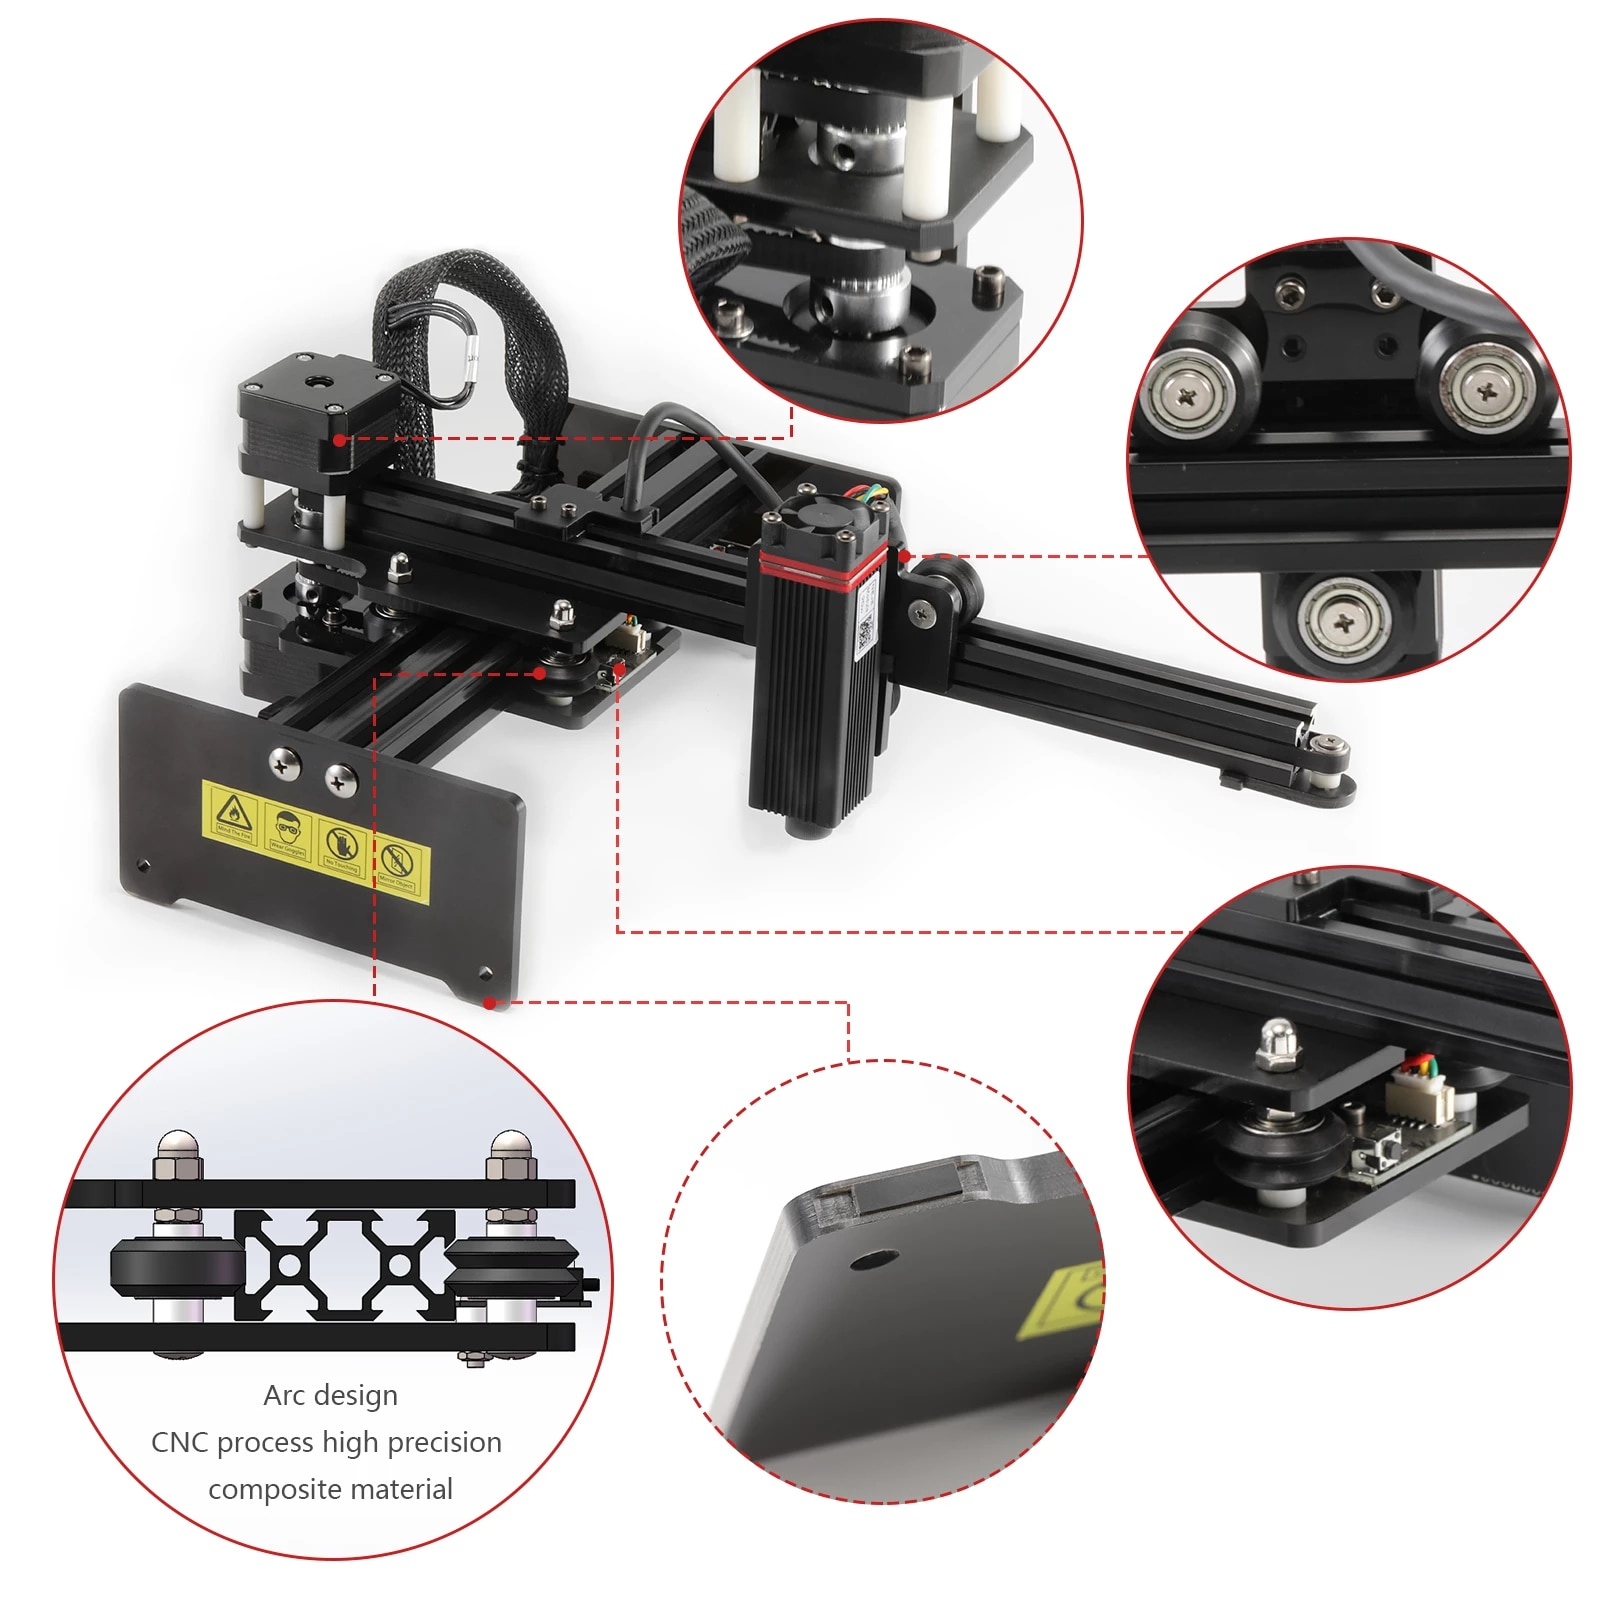 NEJE Master 2s N30820 30W CNC Wood Laser Engraver Cutter Engraving Cutting Machine Router Printer Bluetooth Benbox, LaserGRBL enlarge